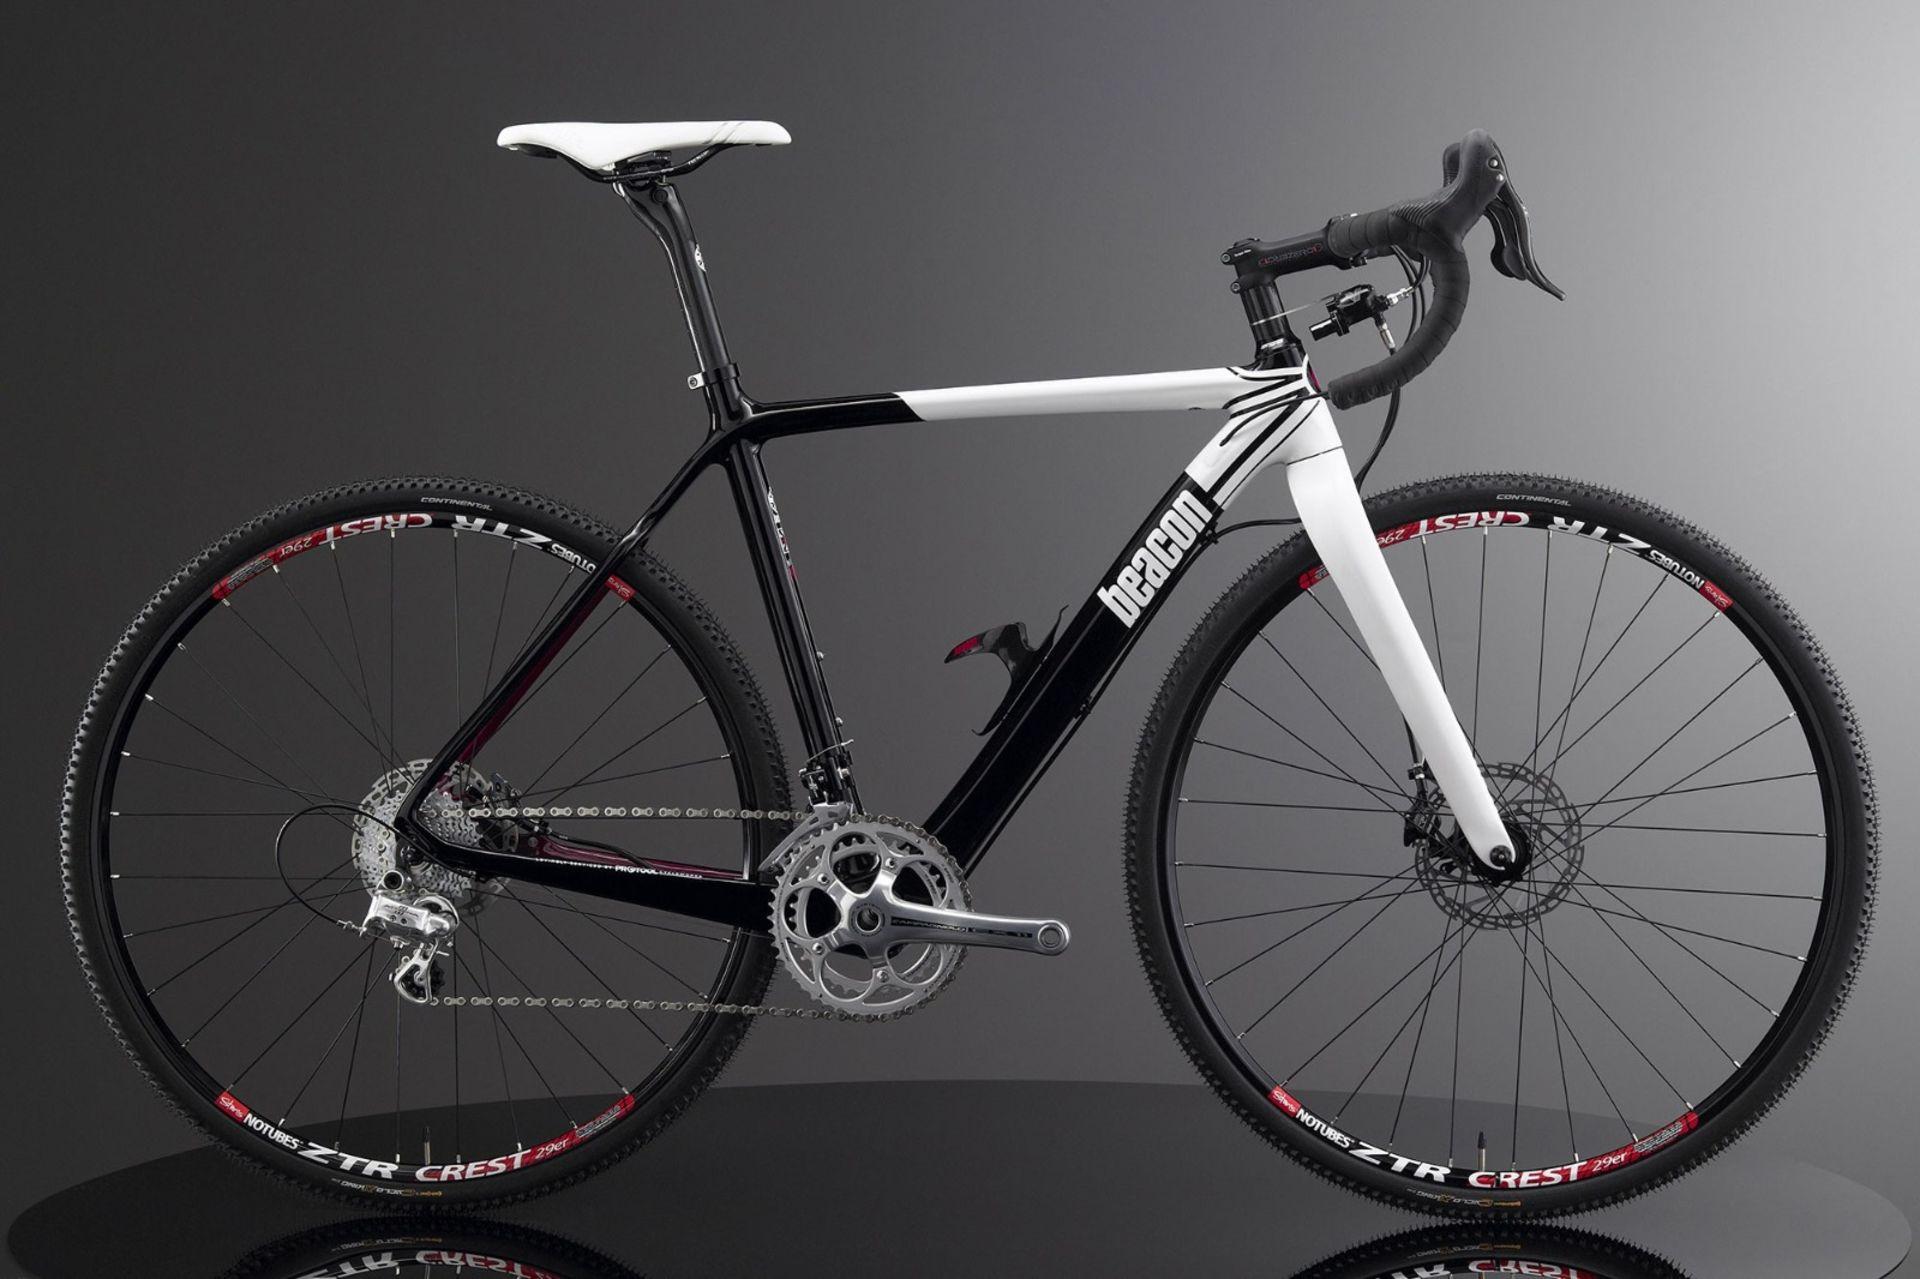 Lot 26 - 1 x Beacon Model BF-45, Size 560, Carbon Fibre Bike Frame in Black & White.